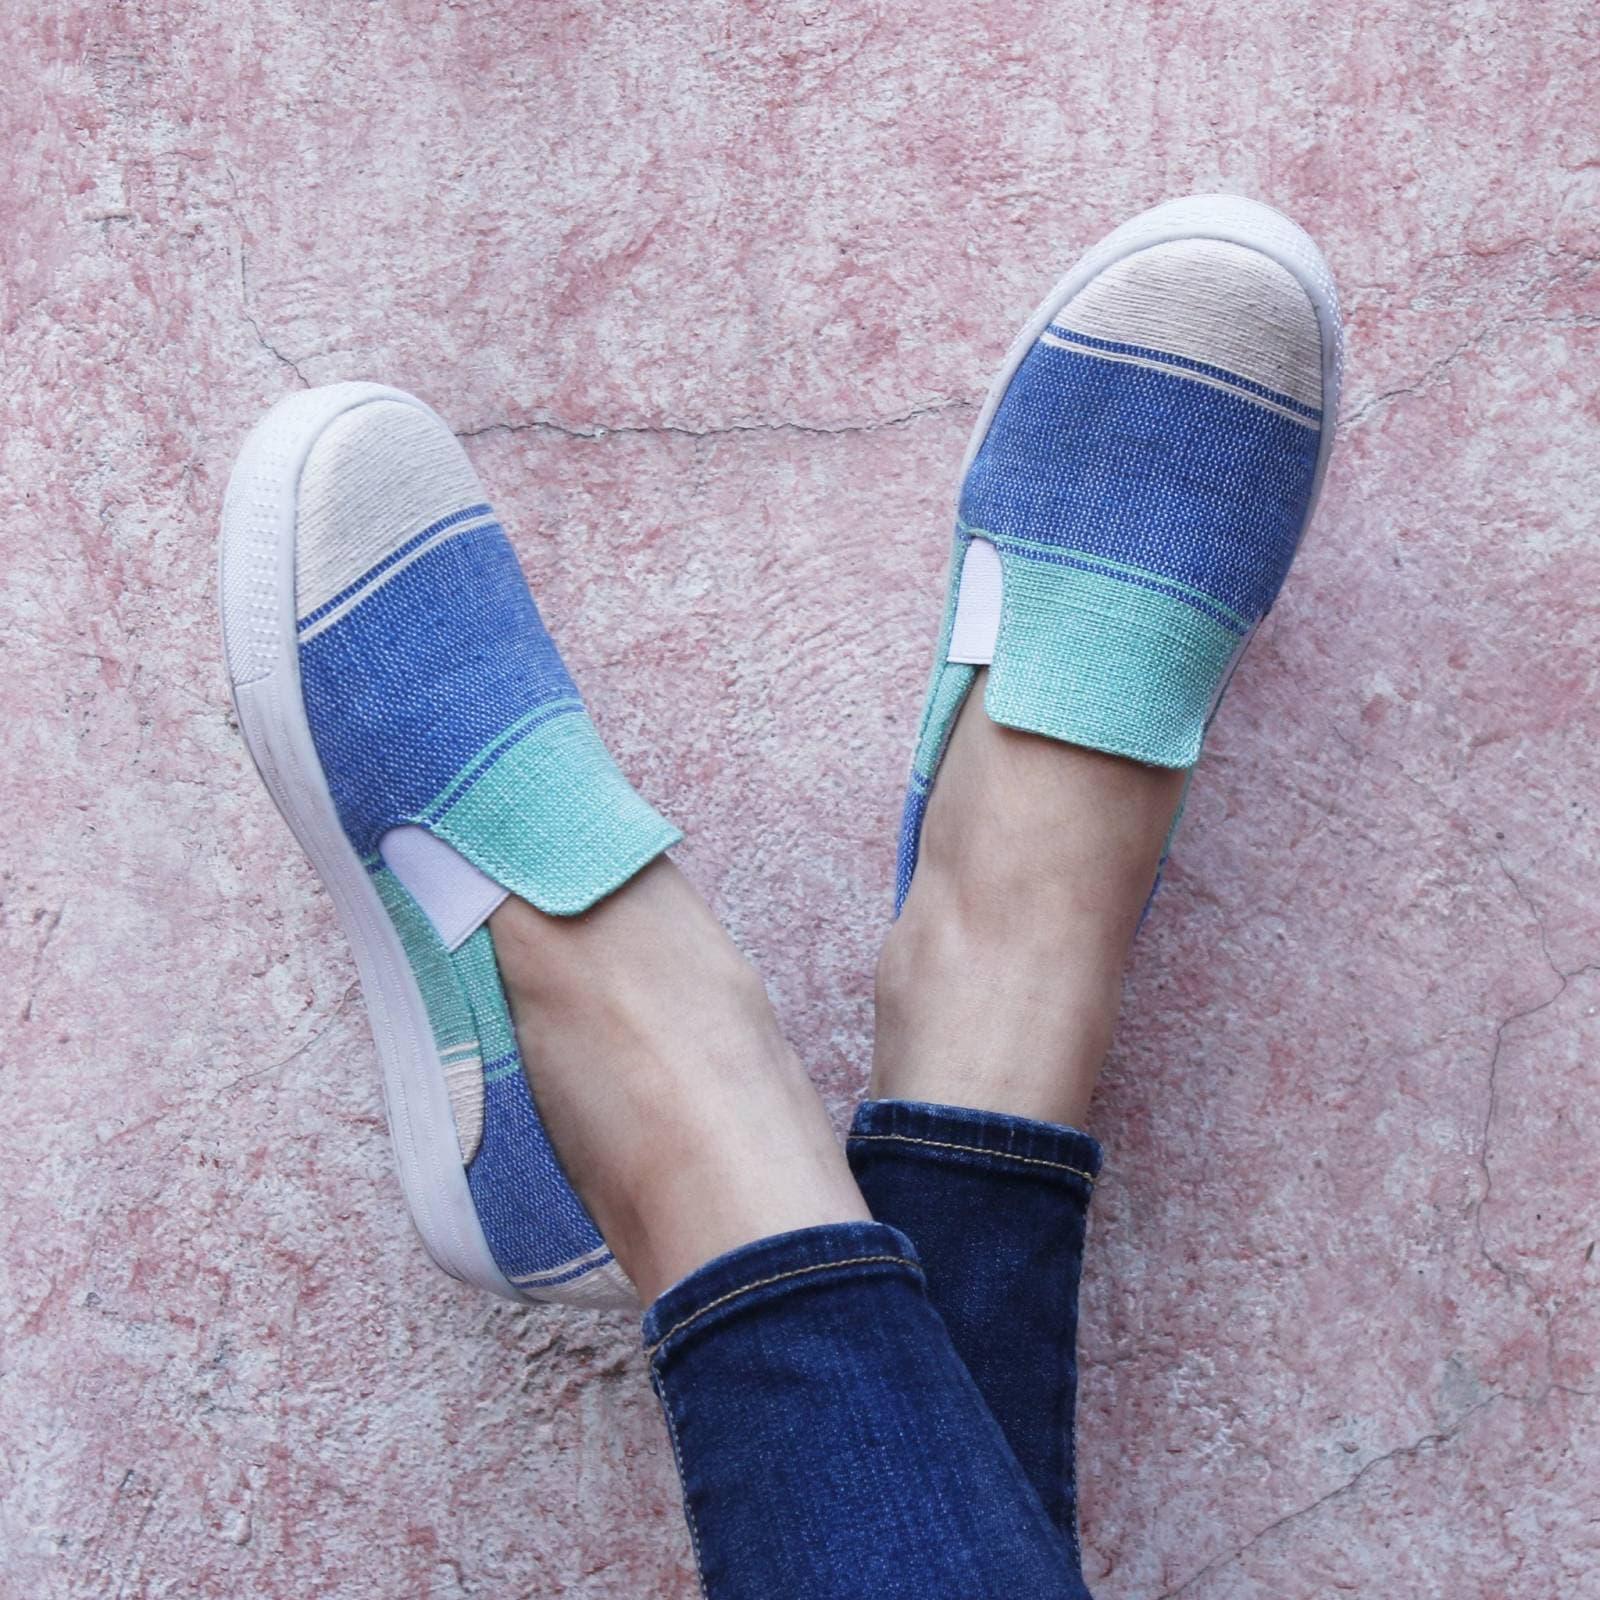 Tenis Zapato Slip On Artesanal Tela Mujer Lola Azul Komoni Talla: 25